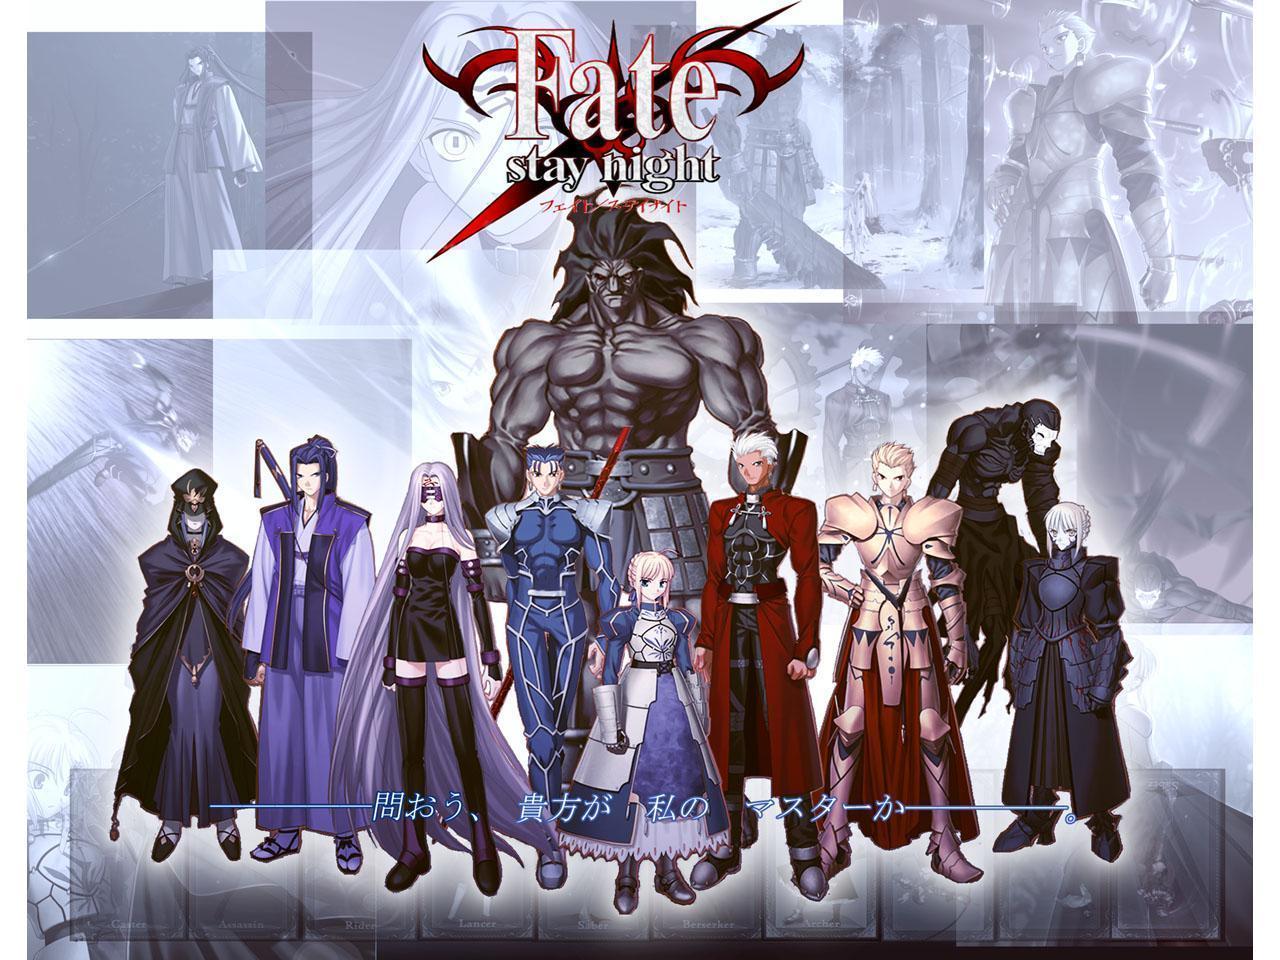 Fatestay Night Servants Anime Photo 3815197 1280x960